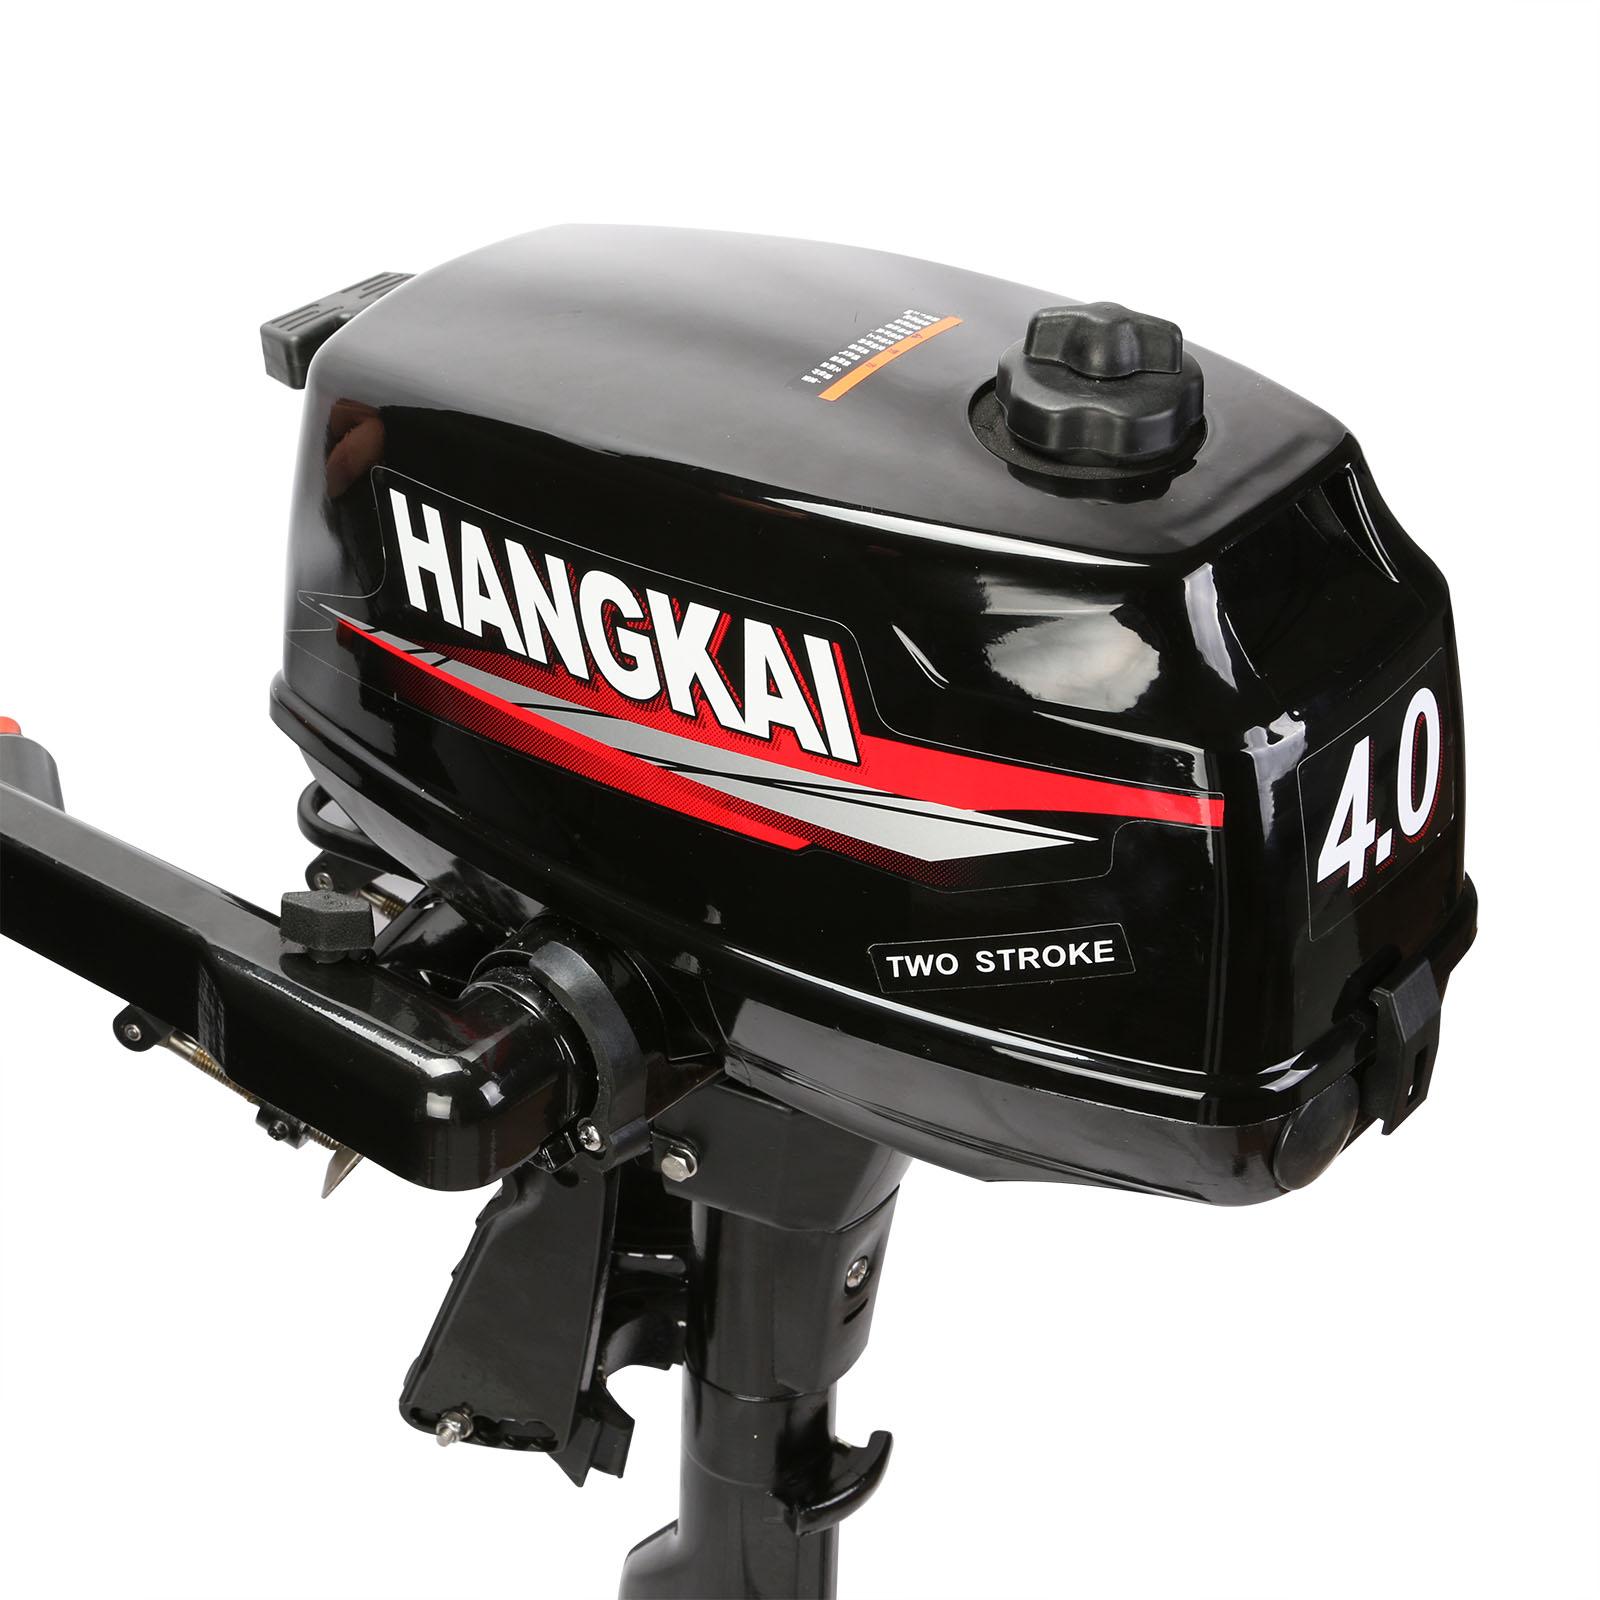 New mercury 4hp 2 stroke outboard motor tiller cdi system for 2 stroke boat motors